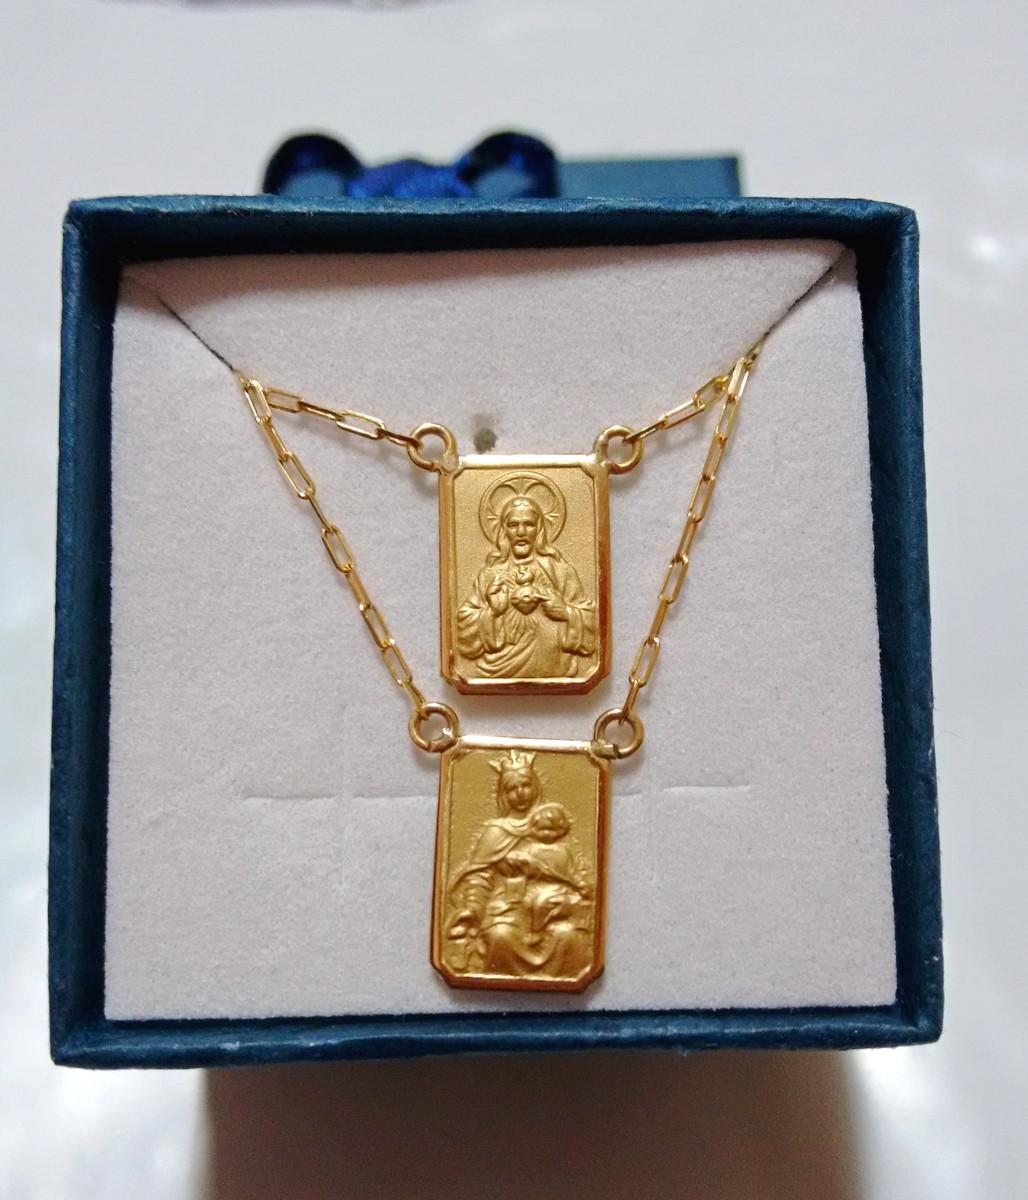 2f86bf9a62687 Escapulario de ouro 3gr 18k no Elo7